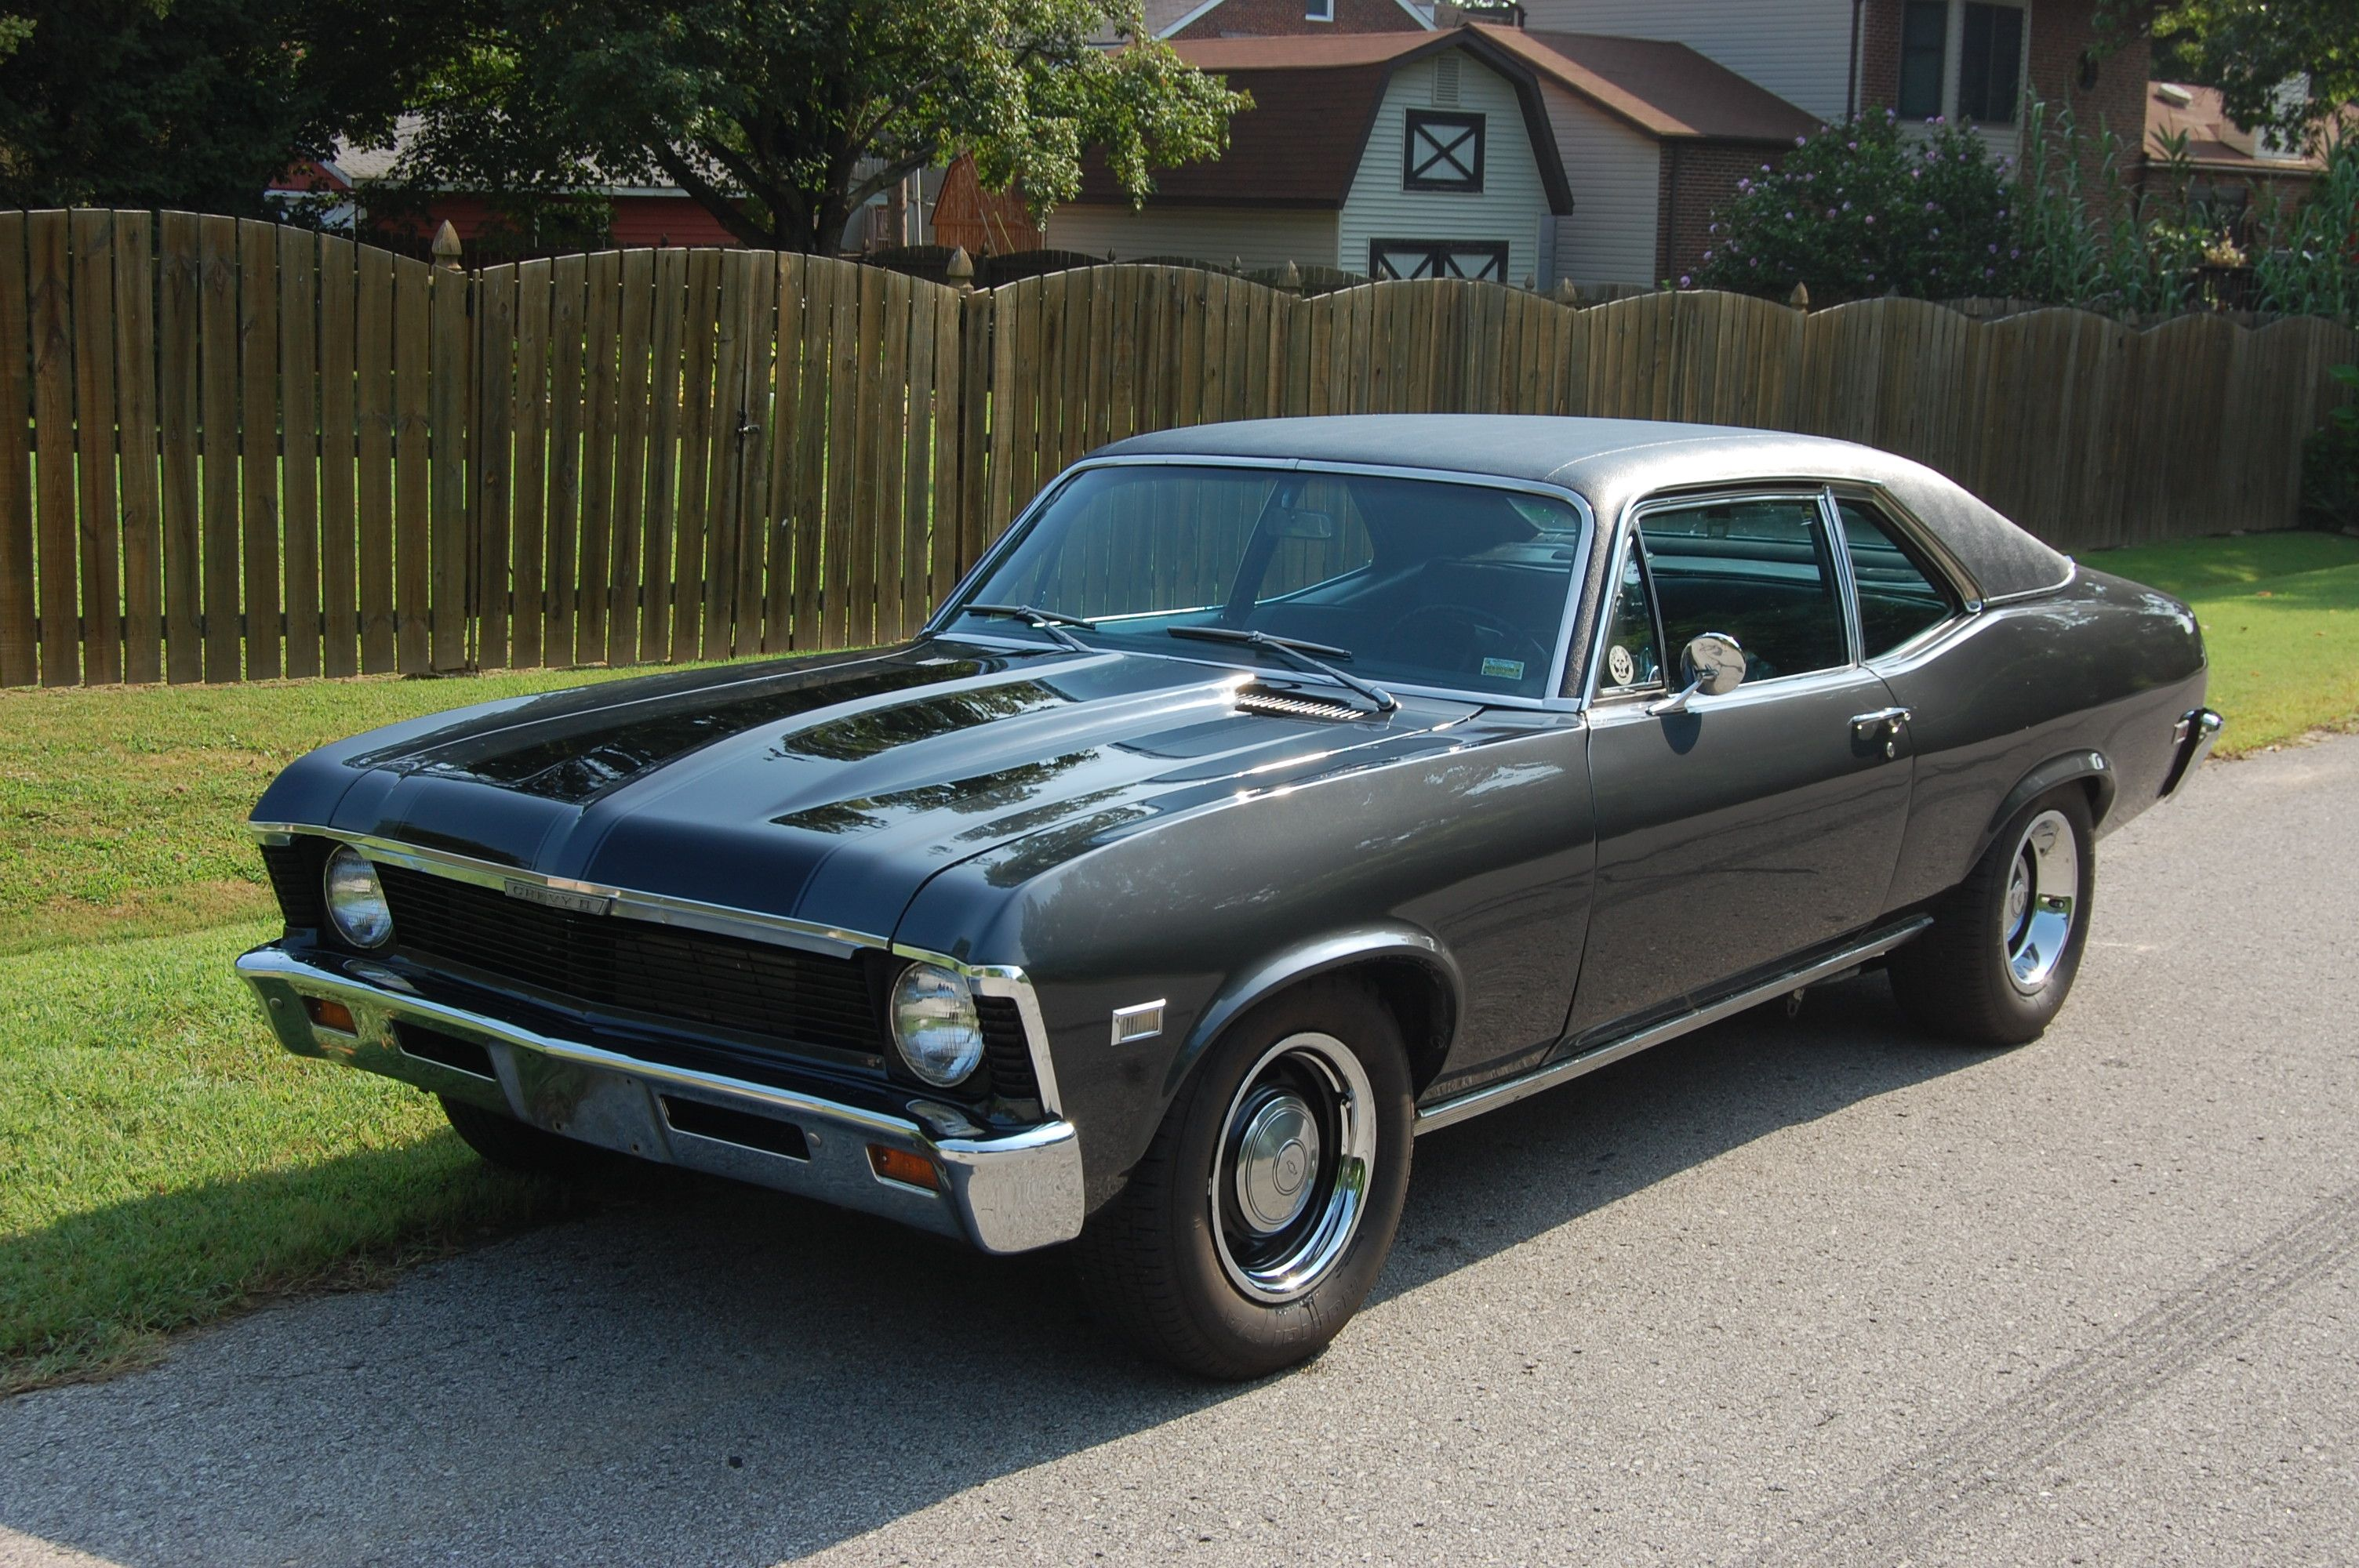 1968 Chevy Nova The First Car I Bought Mine Was Yellow With A Black Vinyl Top Chevy Nova Chevy Black Vinyl